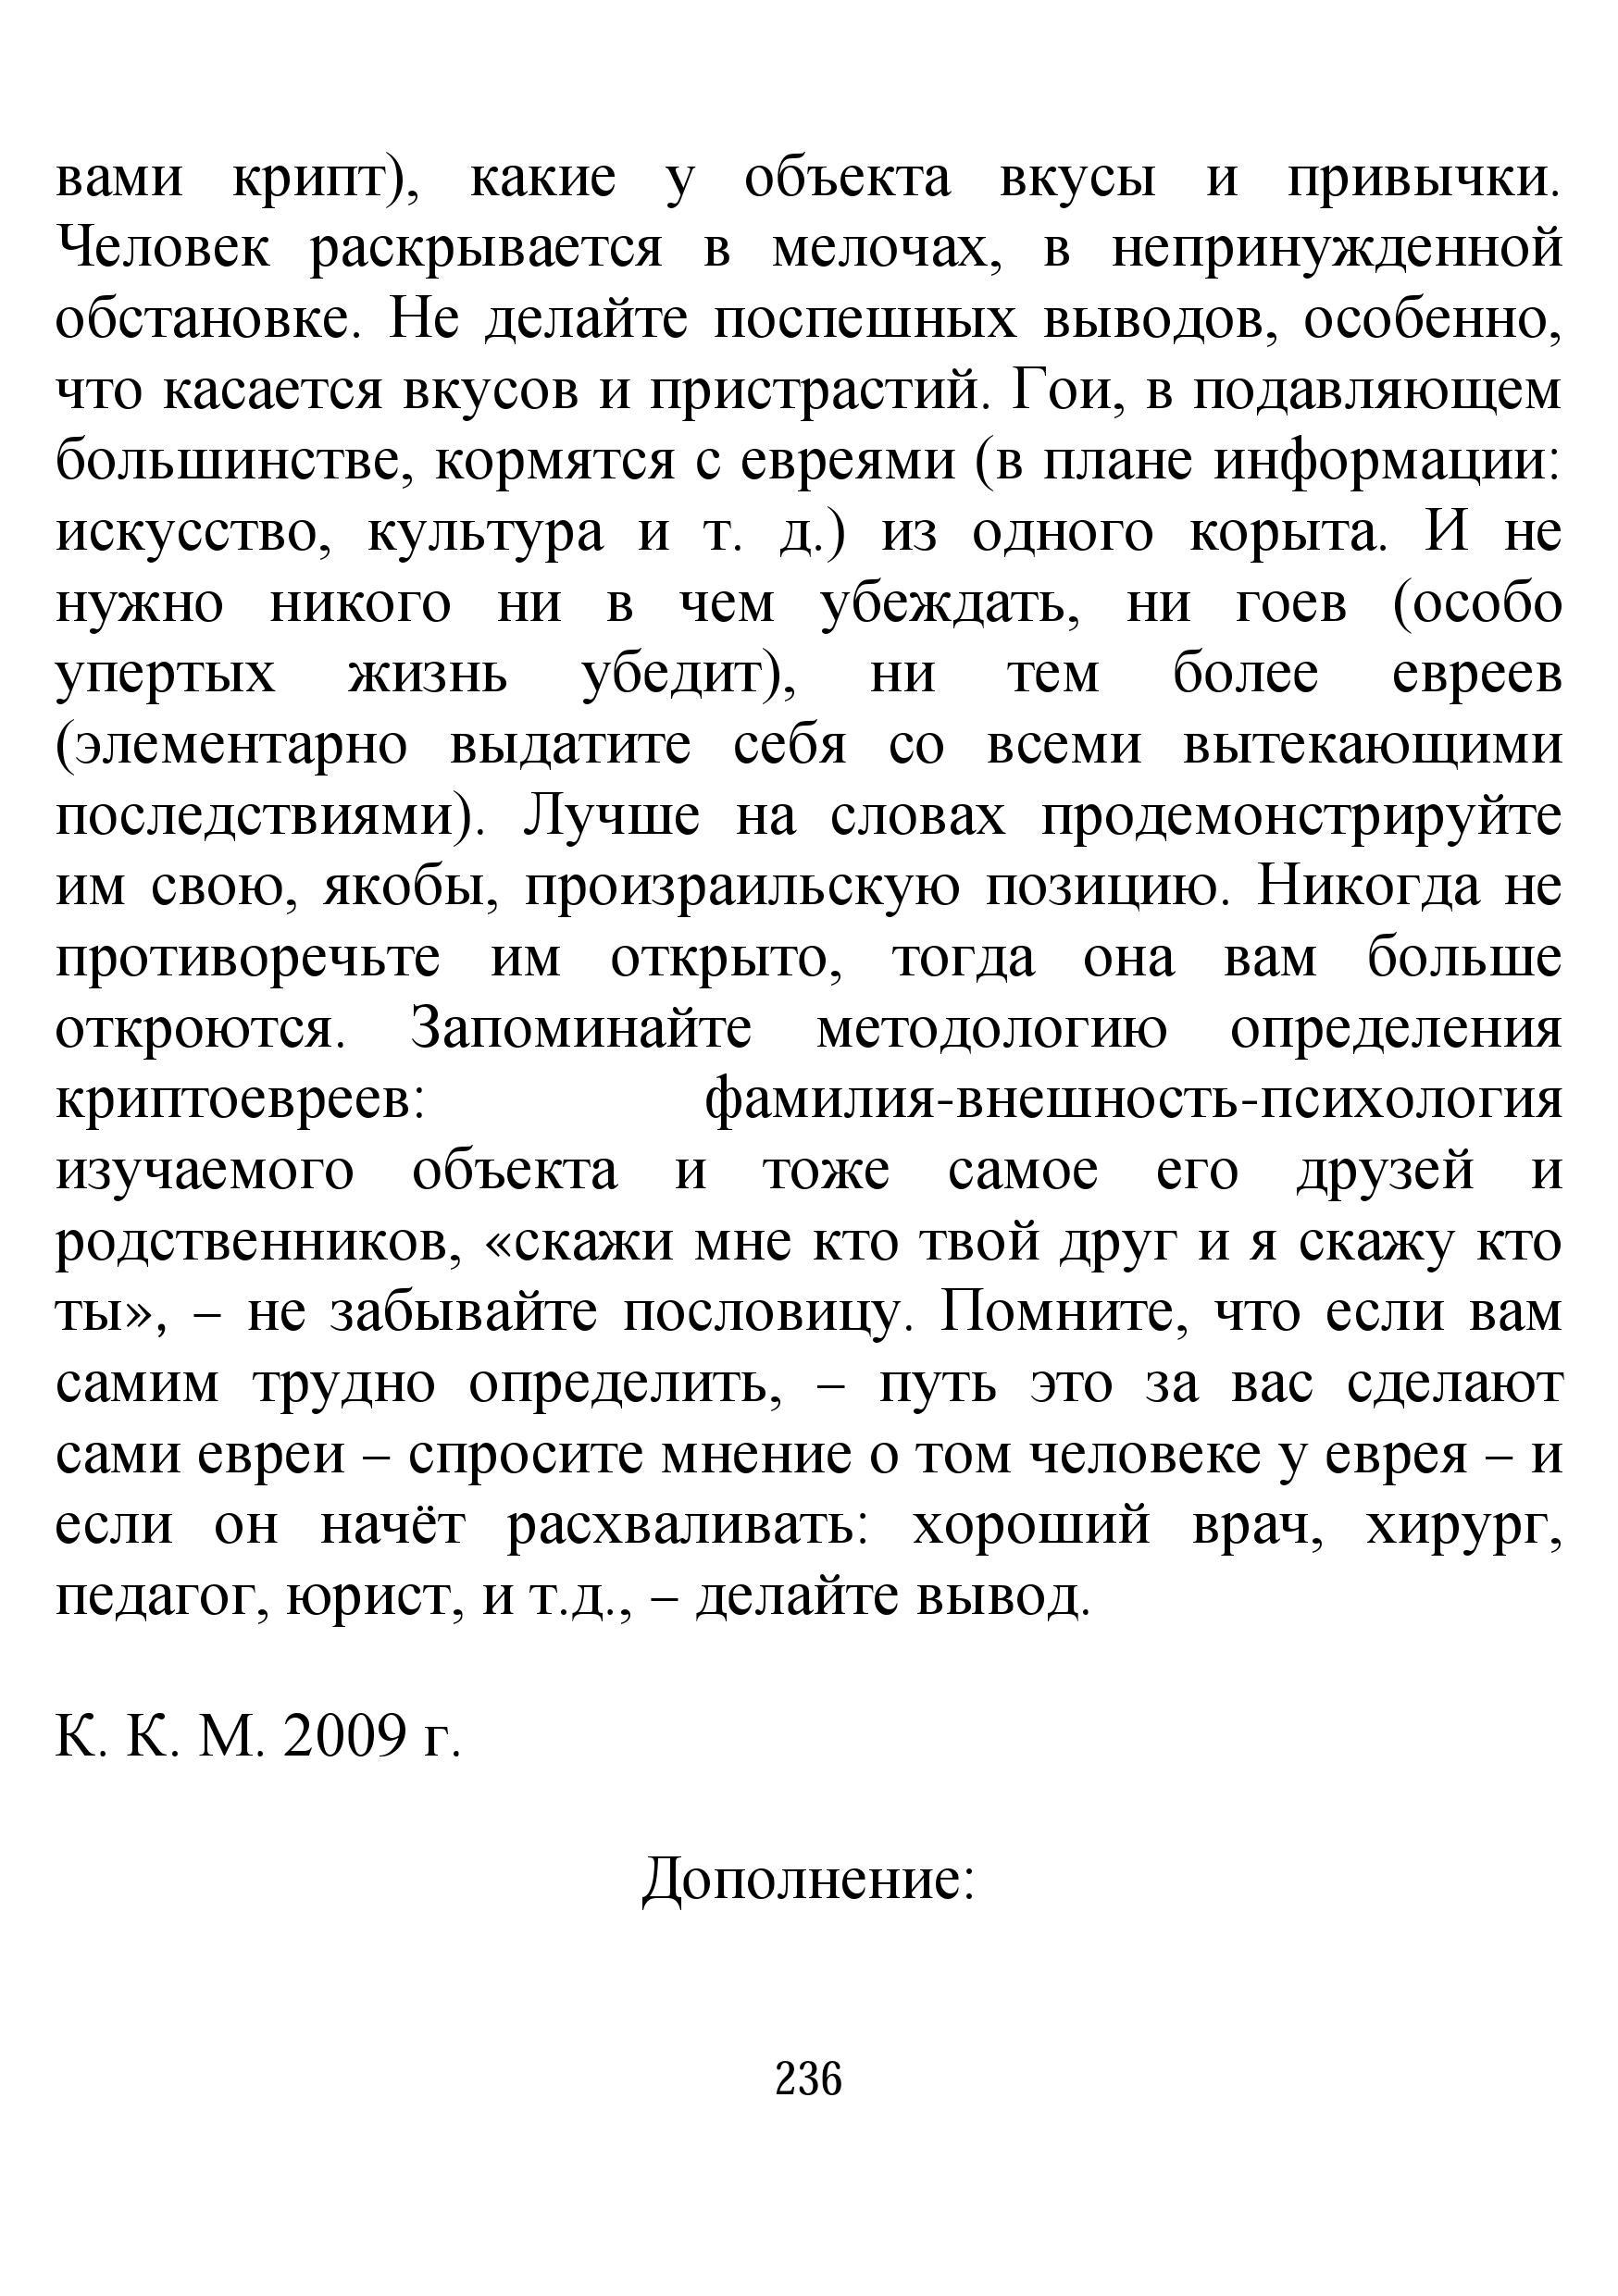 http://s2.uploads.ru/cy9Qx.jpg